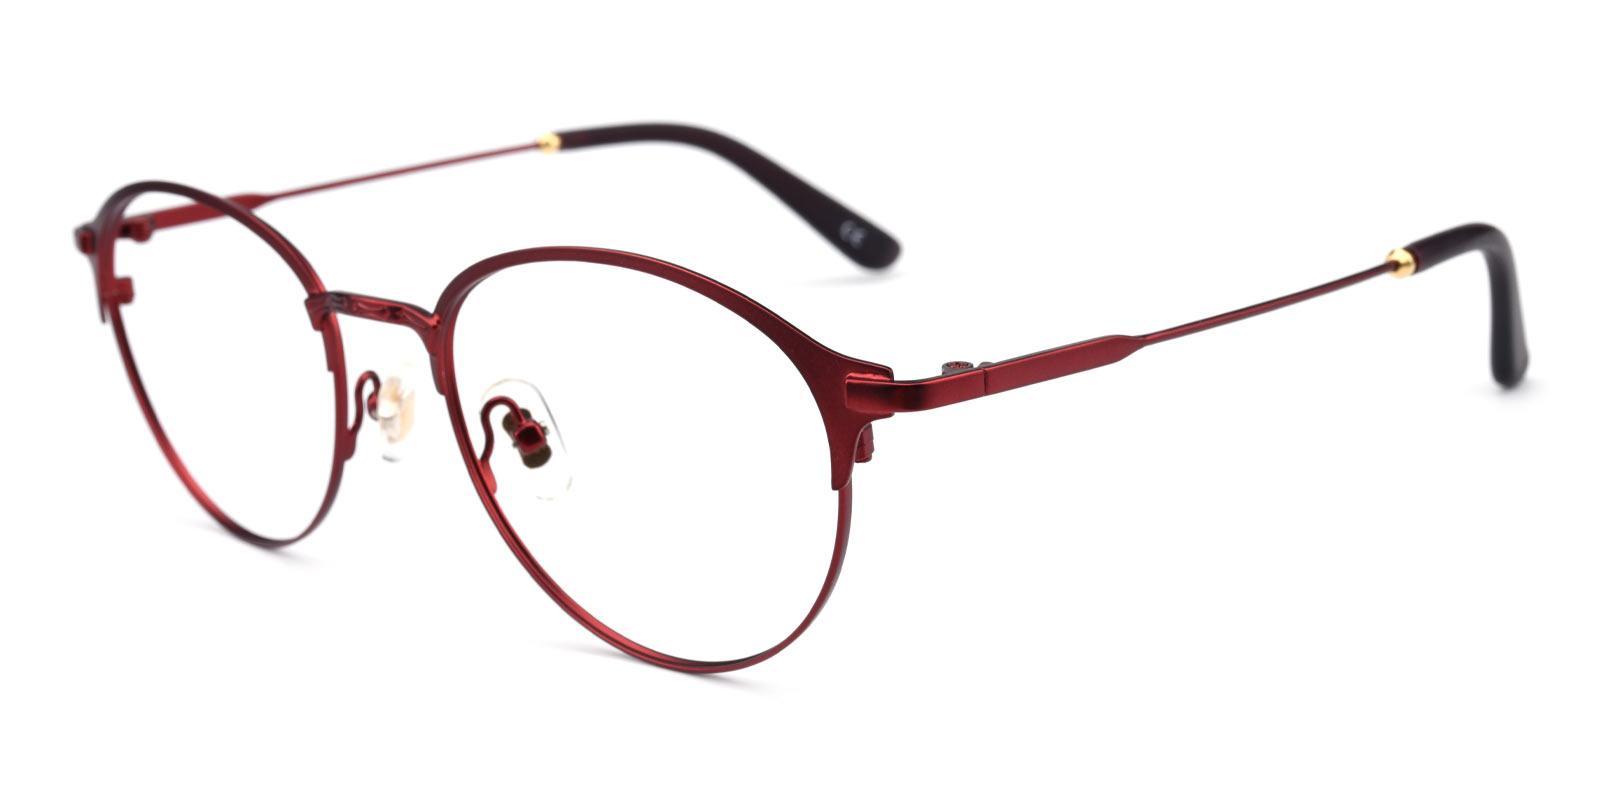 Jean-Red-Round-Metal-Eyeglasses-additional1